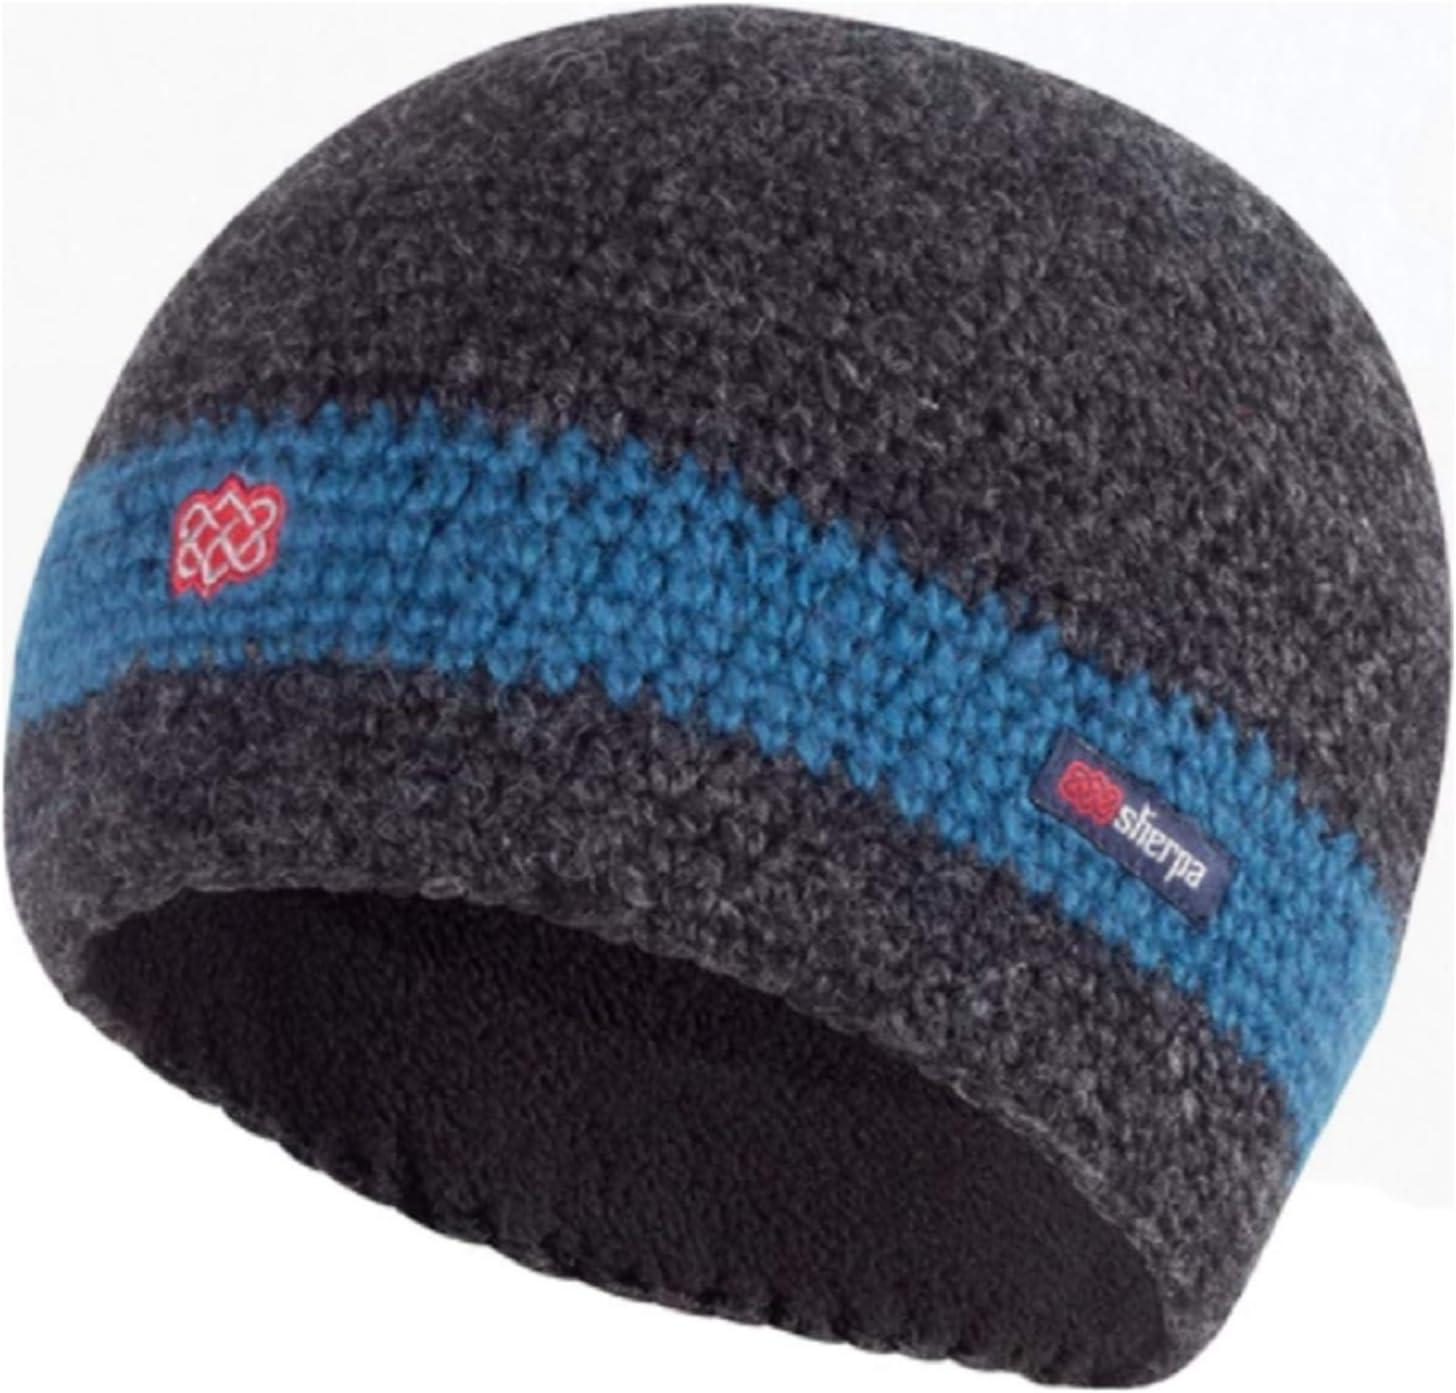 Sherpa Raja Blue Renzing Hat